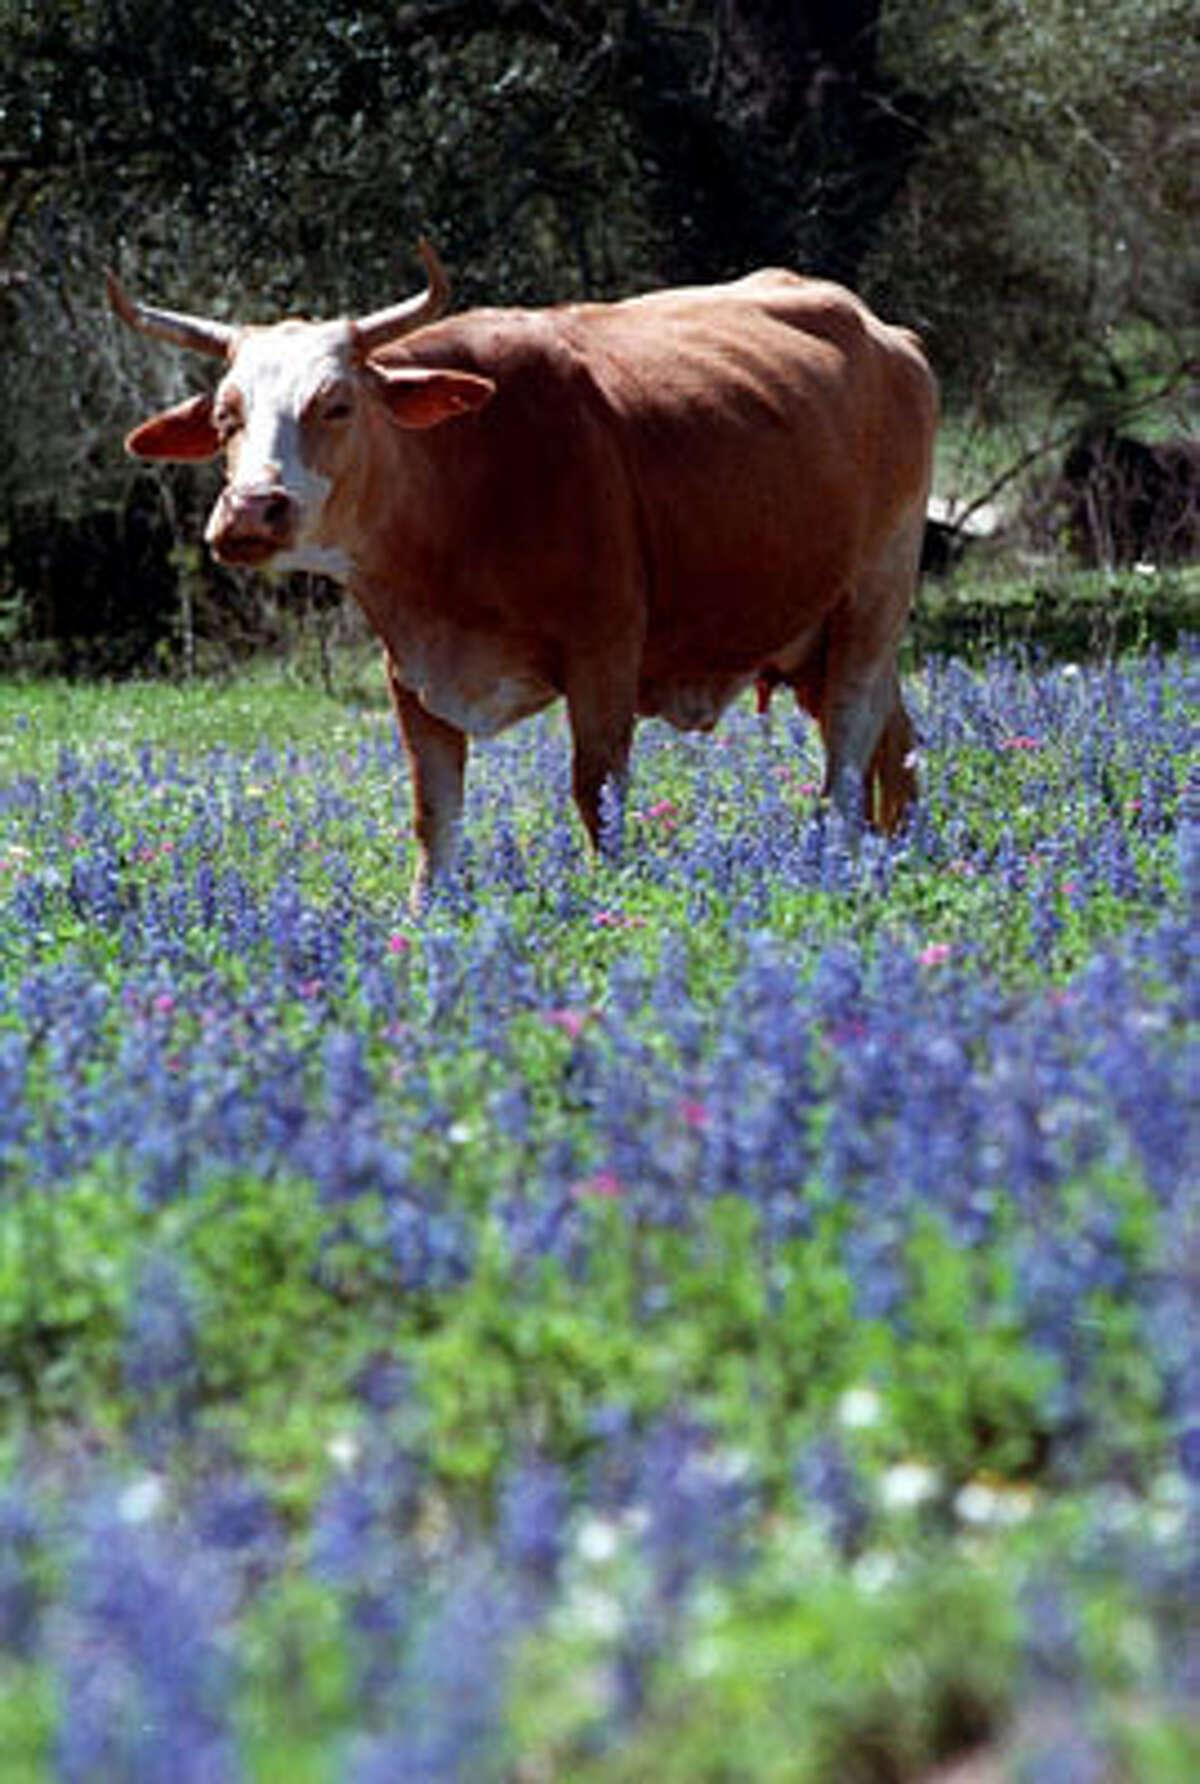 A cow walks through the bluebonnets on Jim Collums ranch, near Poteet.